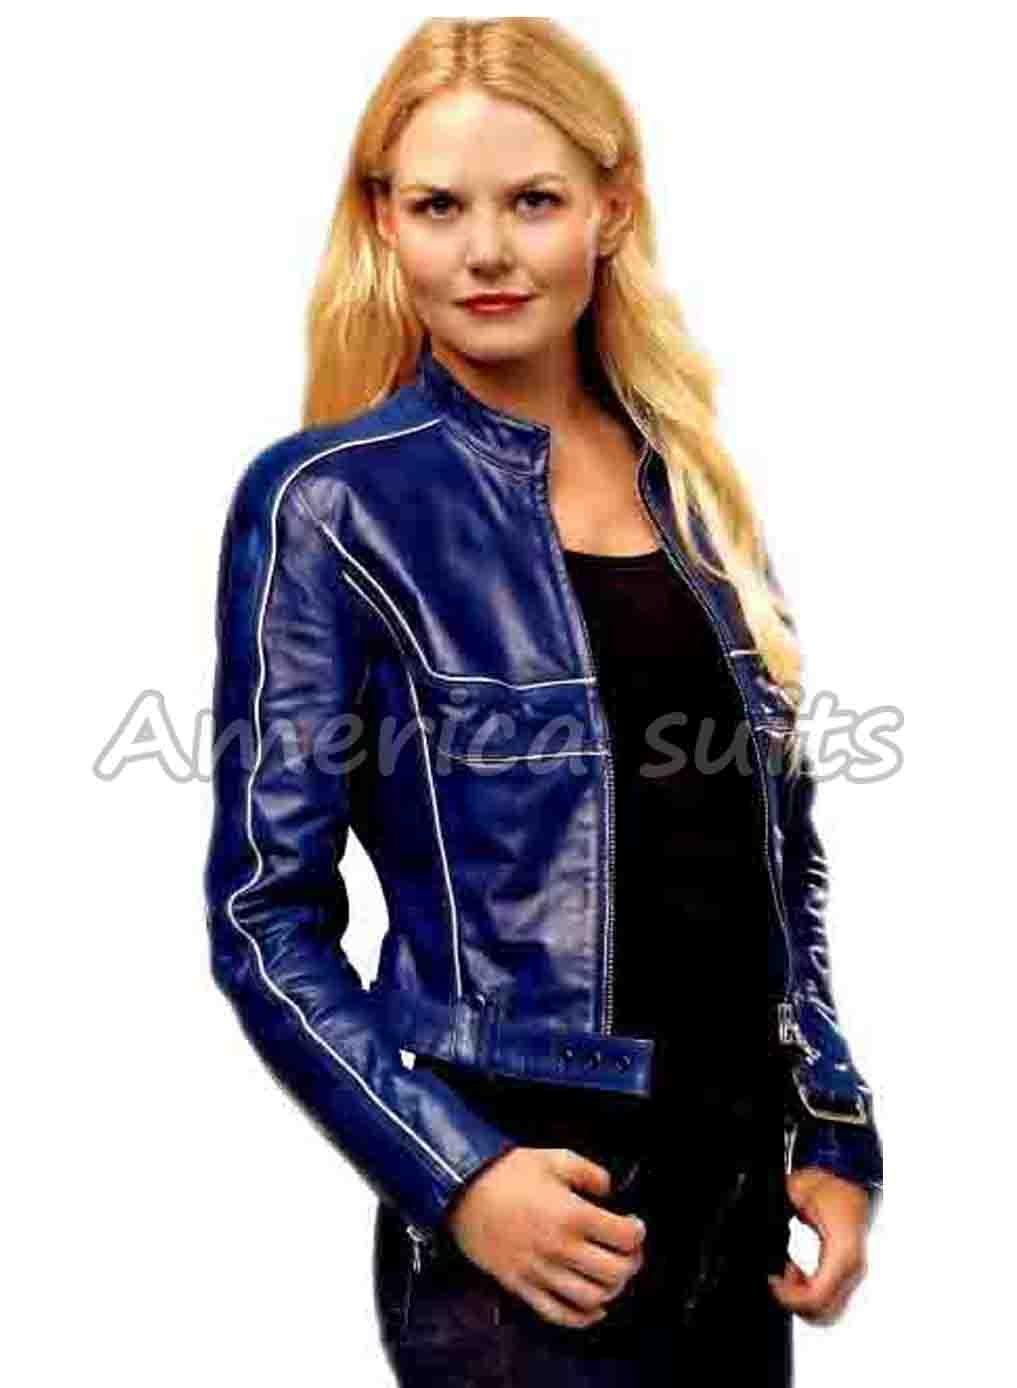 emma-swan-bkue-leather-jacket-500x600